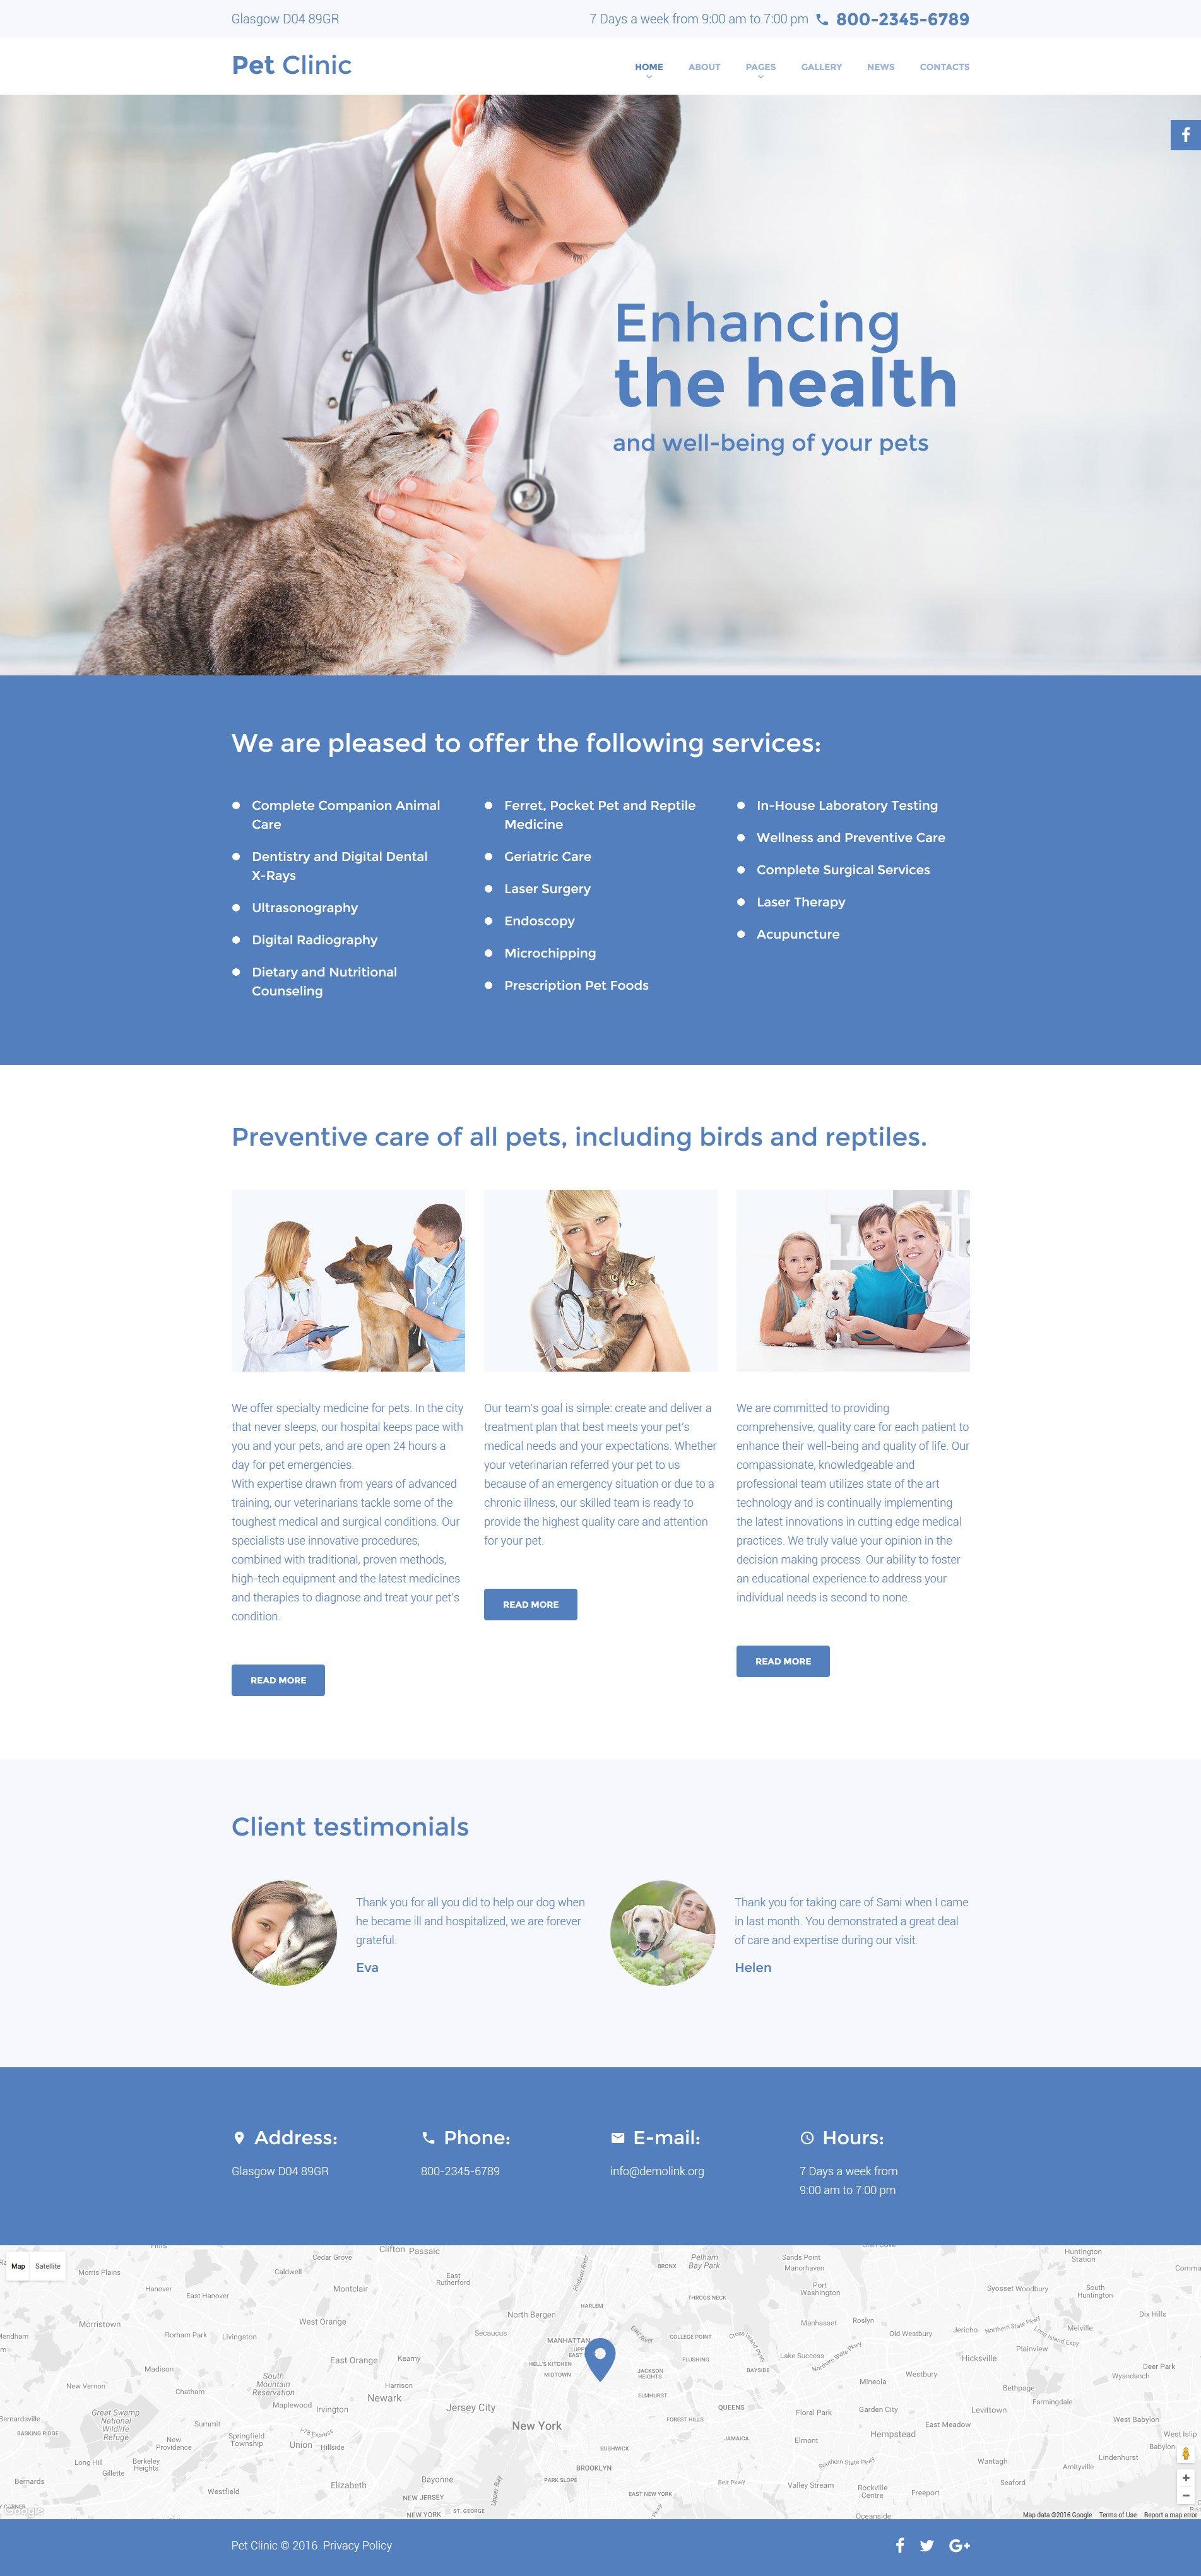 Pet Clinic - Vet Medicine Responsive Joomla Template - screenshot